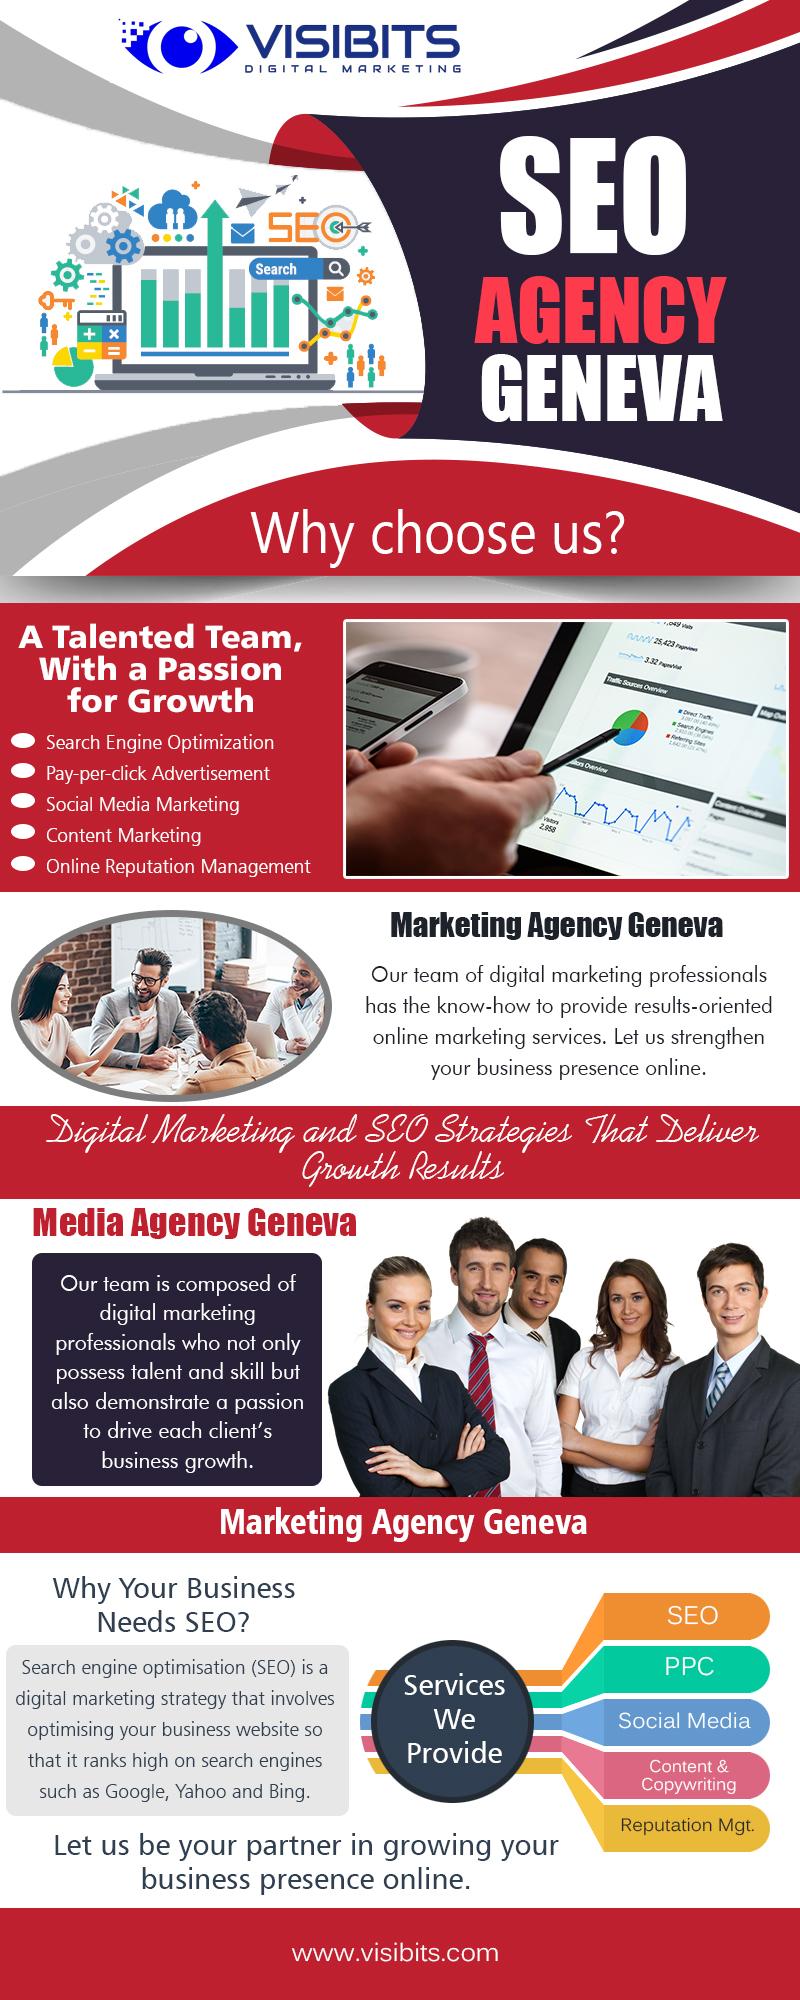 SEO Agency in Geneva | Call — 41 22 575 39 51 | visibits.com